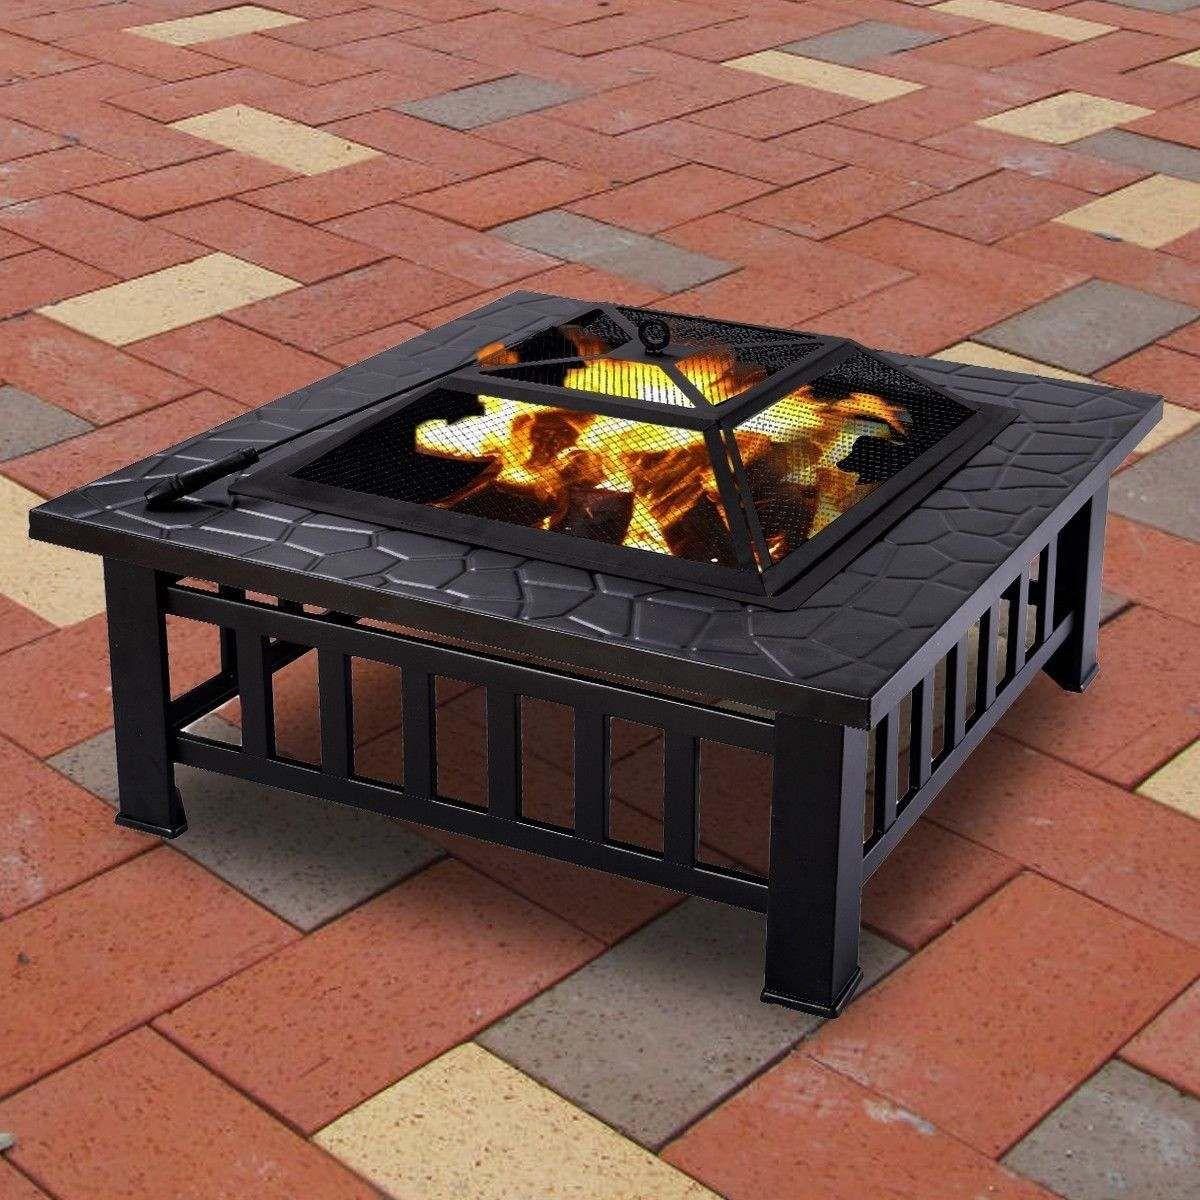 hermosa fogata exterior fire pit patio lea jardin chimenea